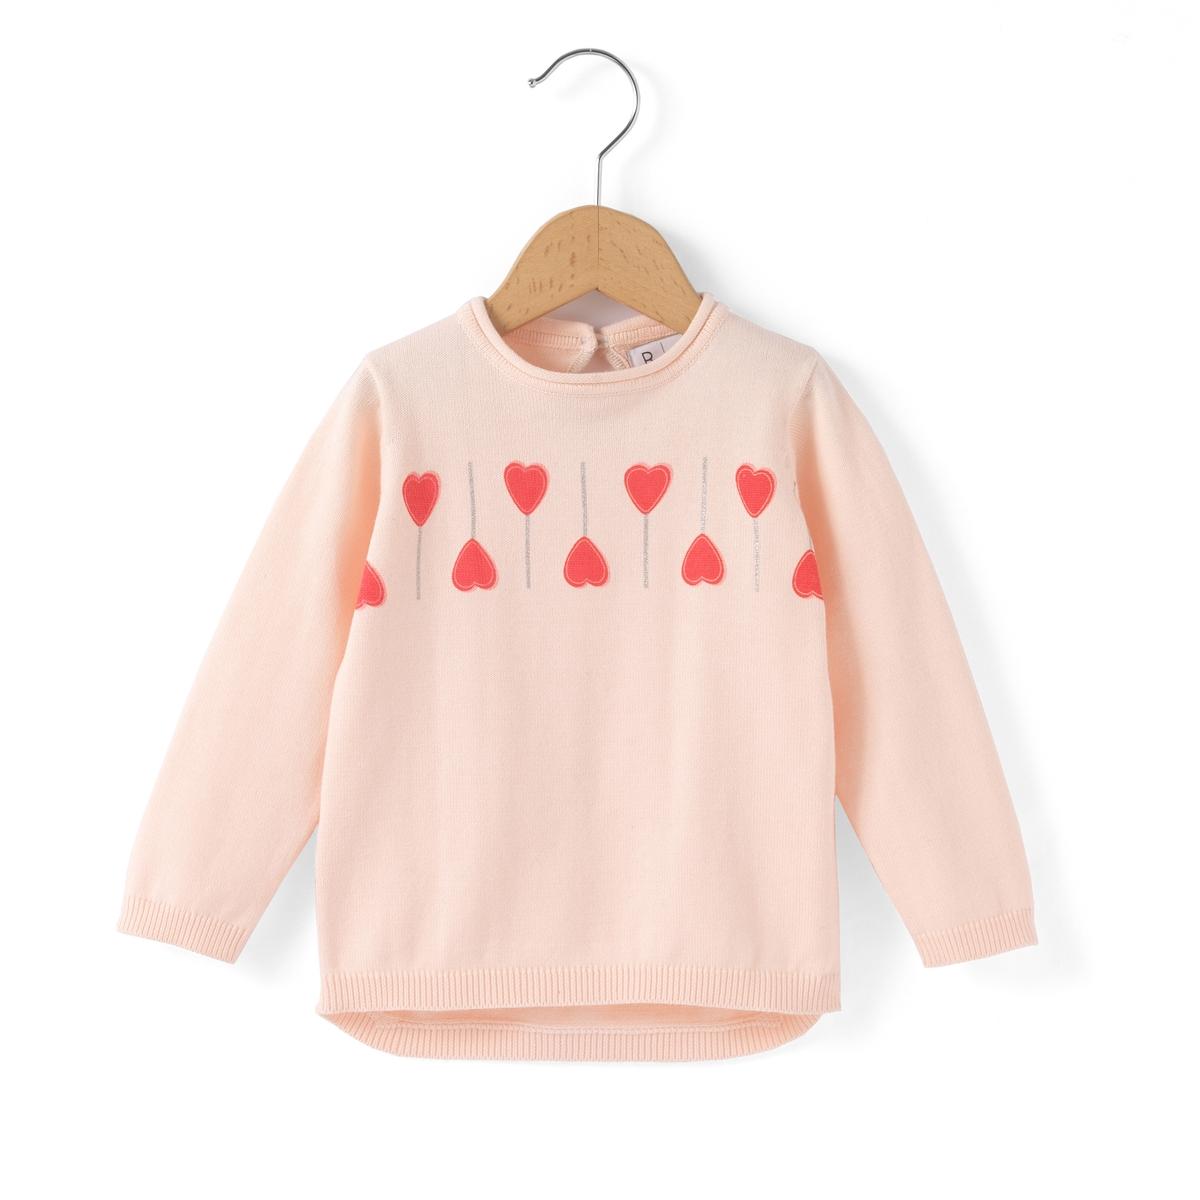 Пуловер с сердечками, 1 мес. - 3 года